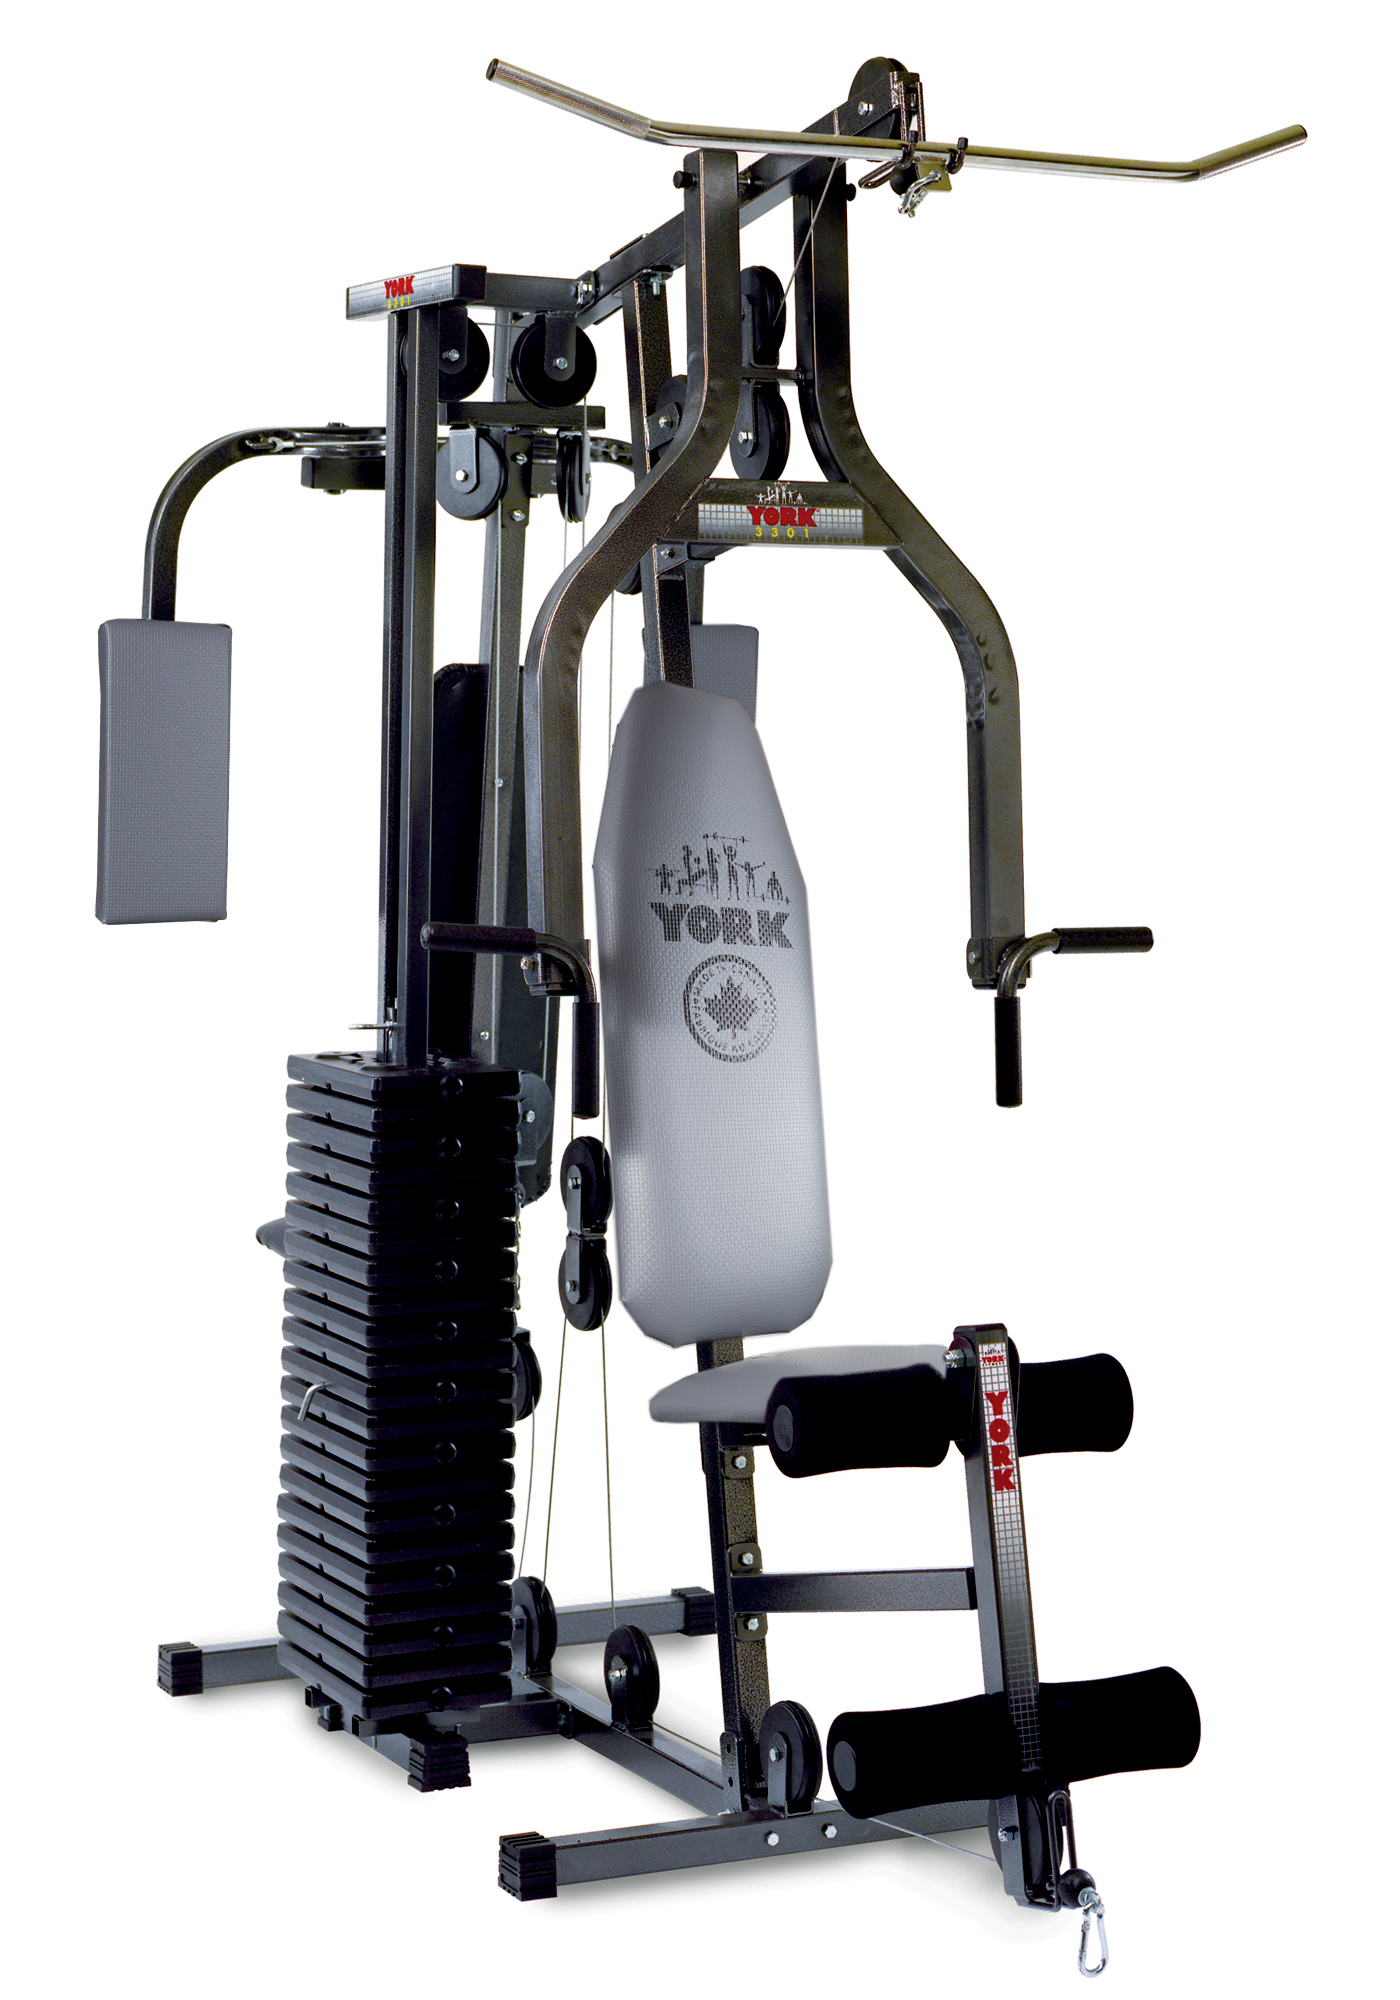 3301 Power Max Home Gym Home Gym Equipment York Barbell